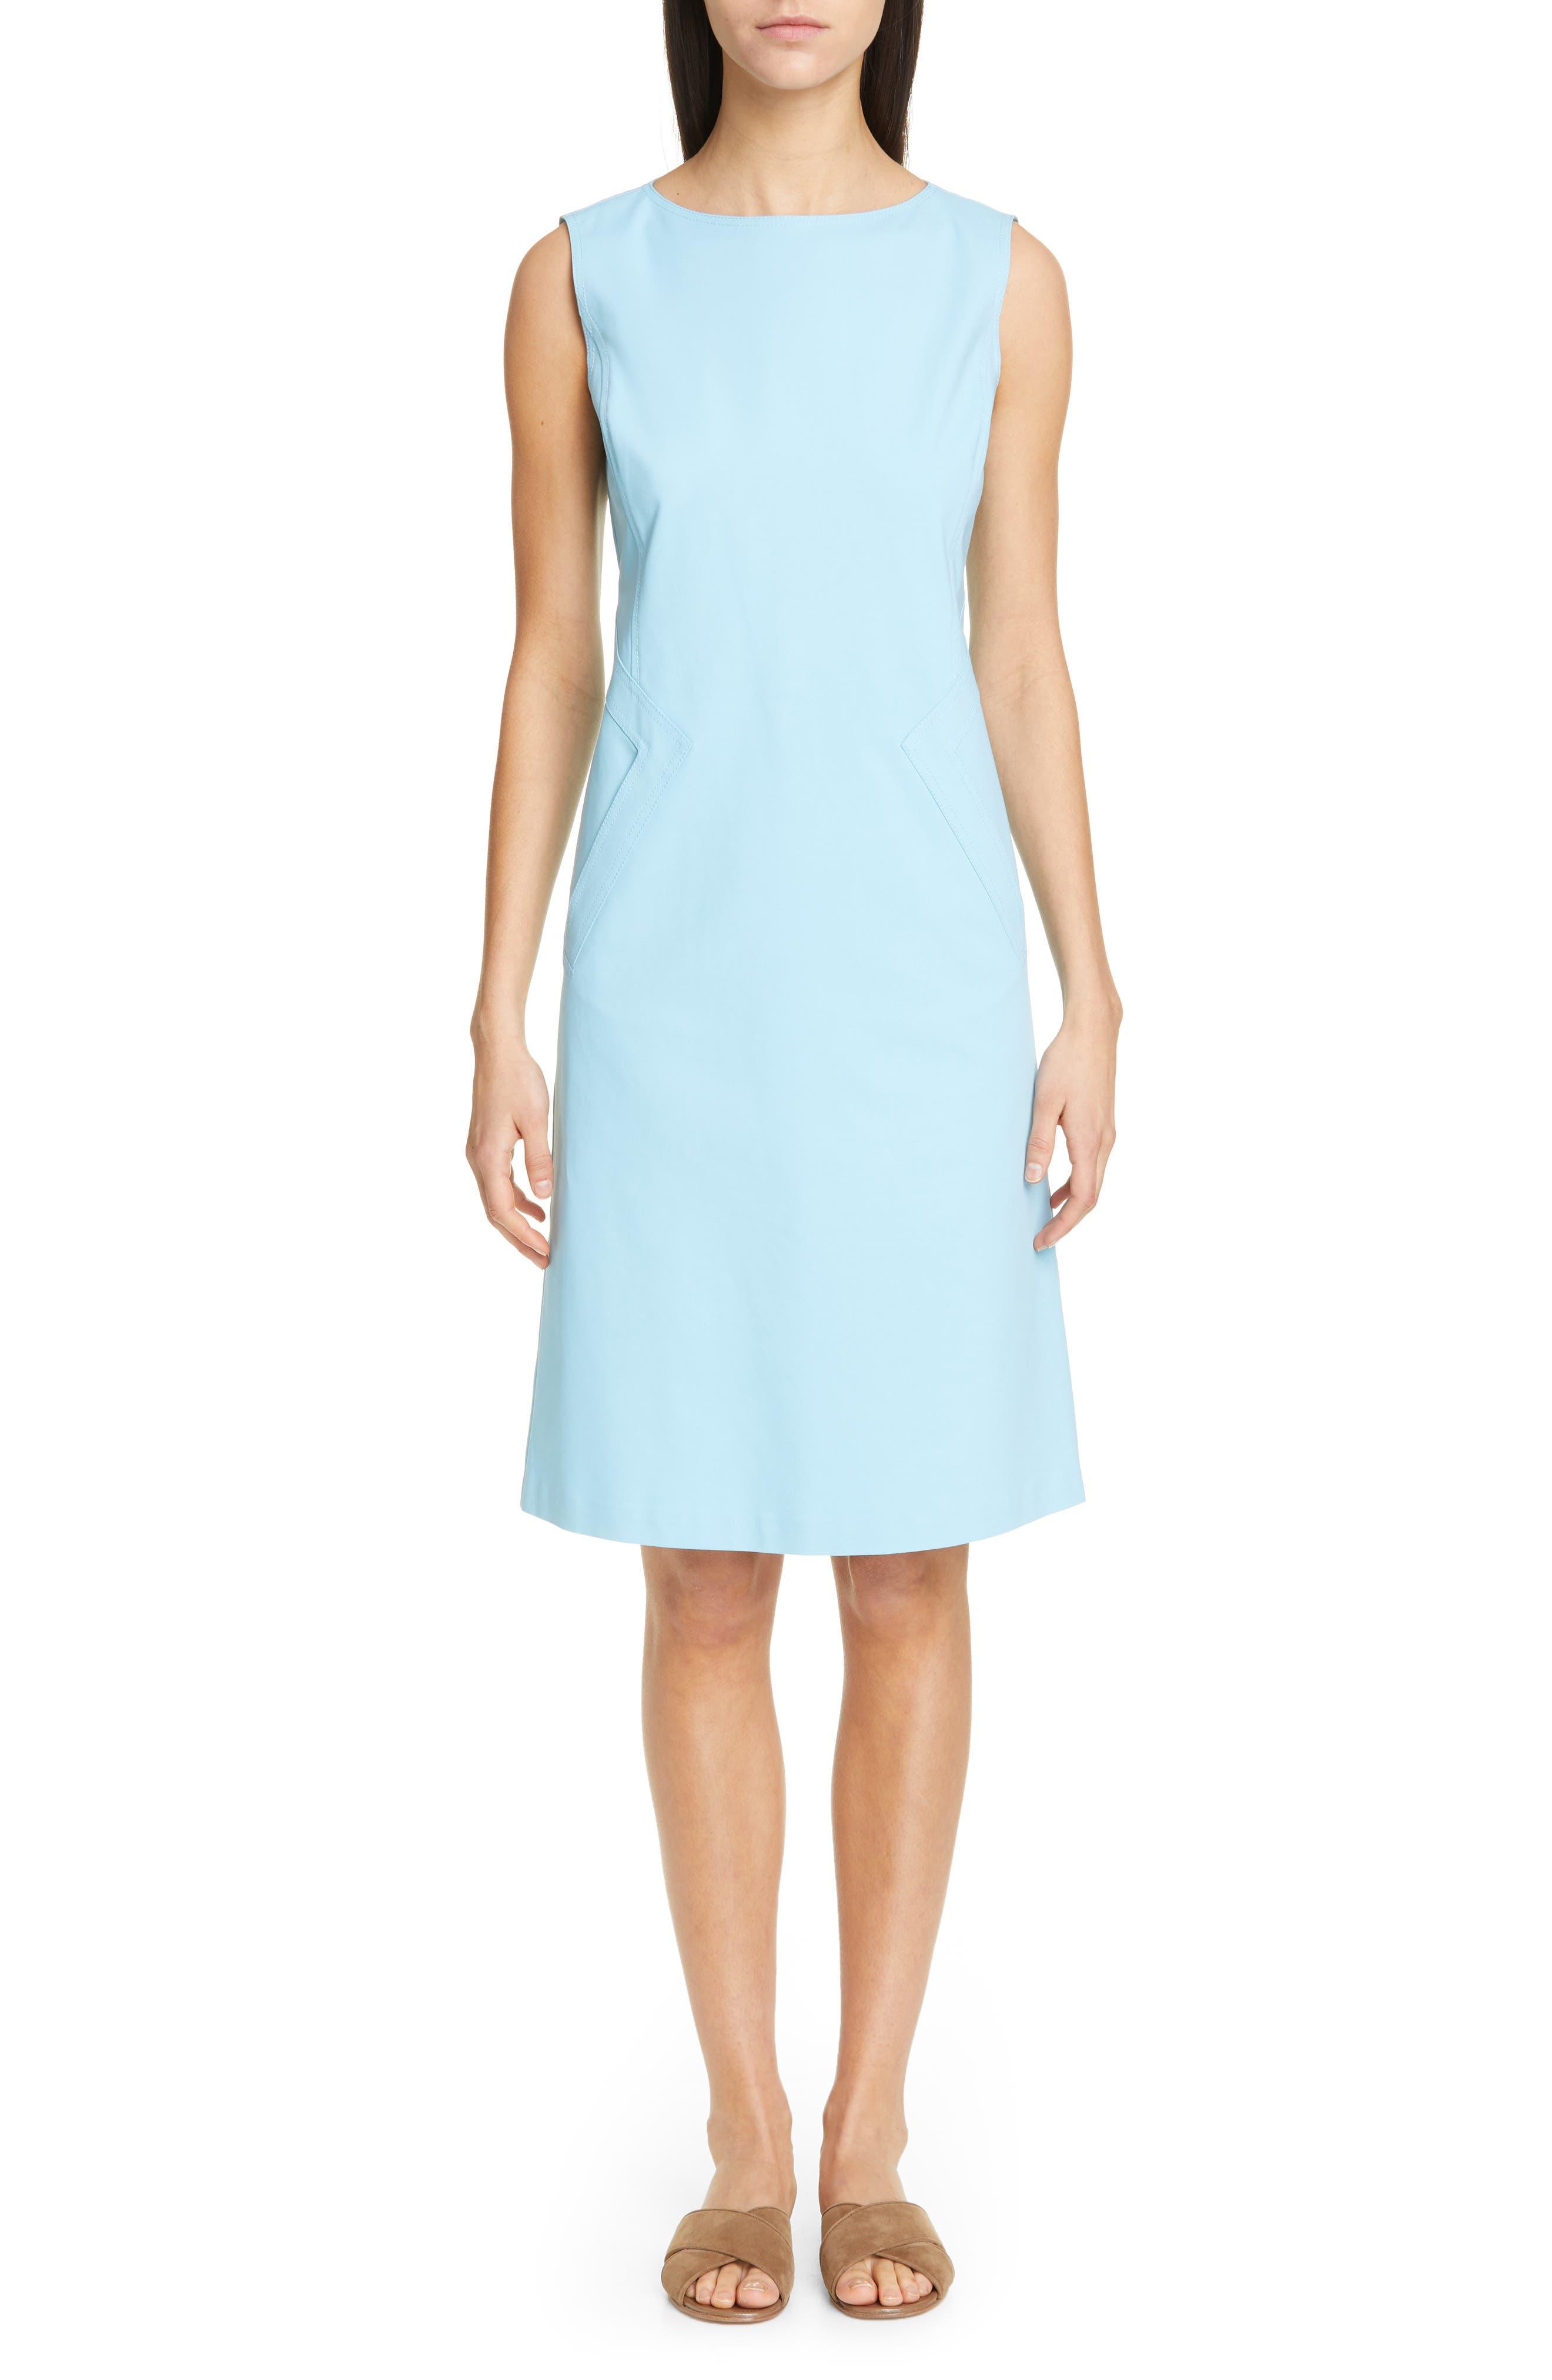 LAFAYETTE 148 NEW YORK Ensley Shift Dress, Main, color, LAGOON